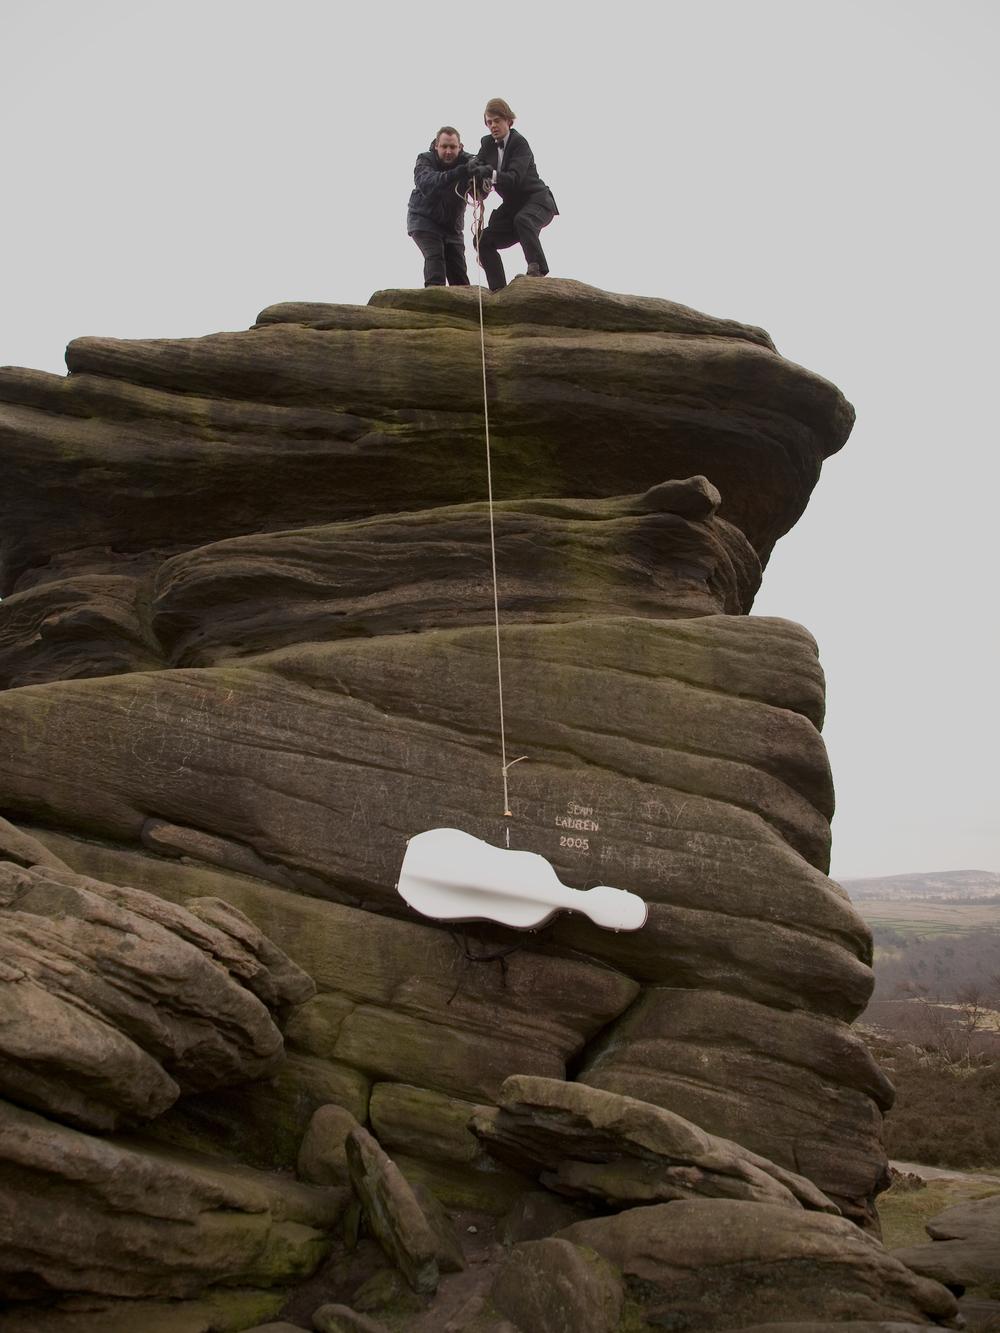 Hauling the White Cello